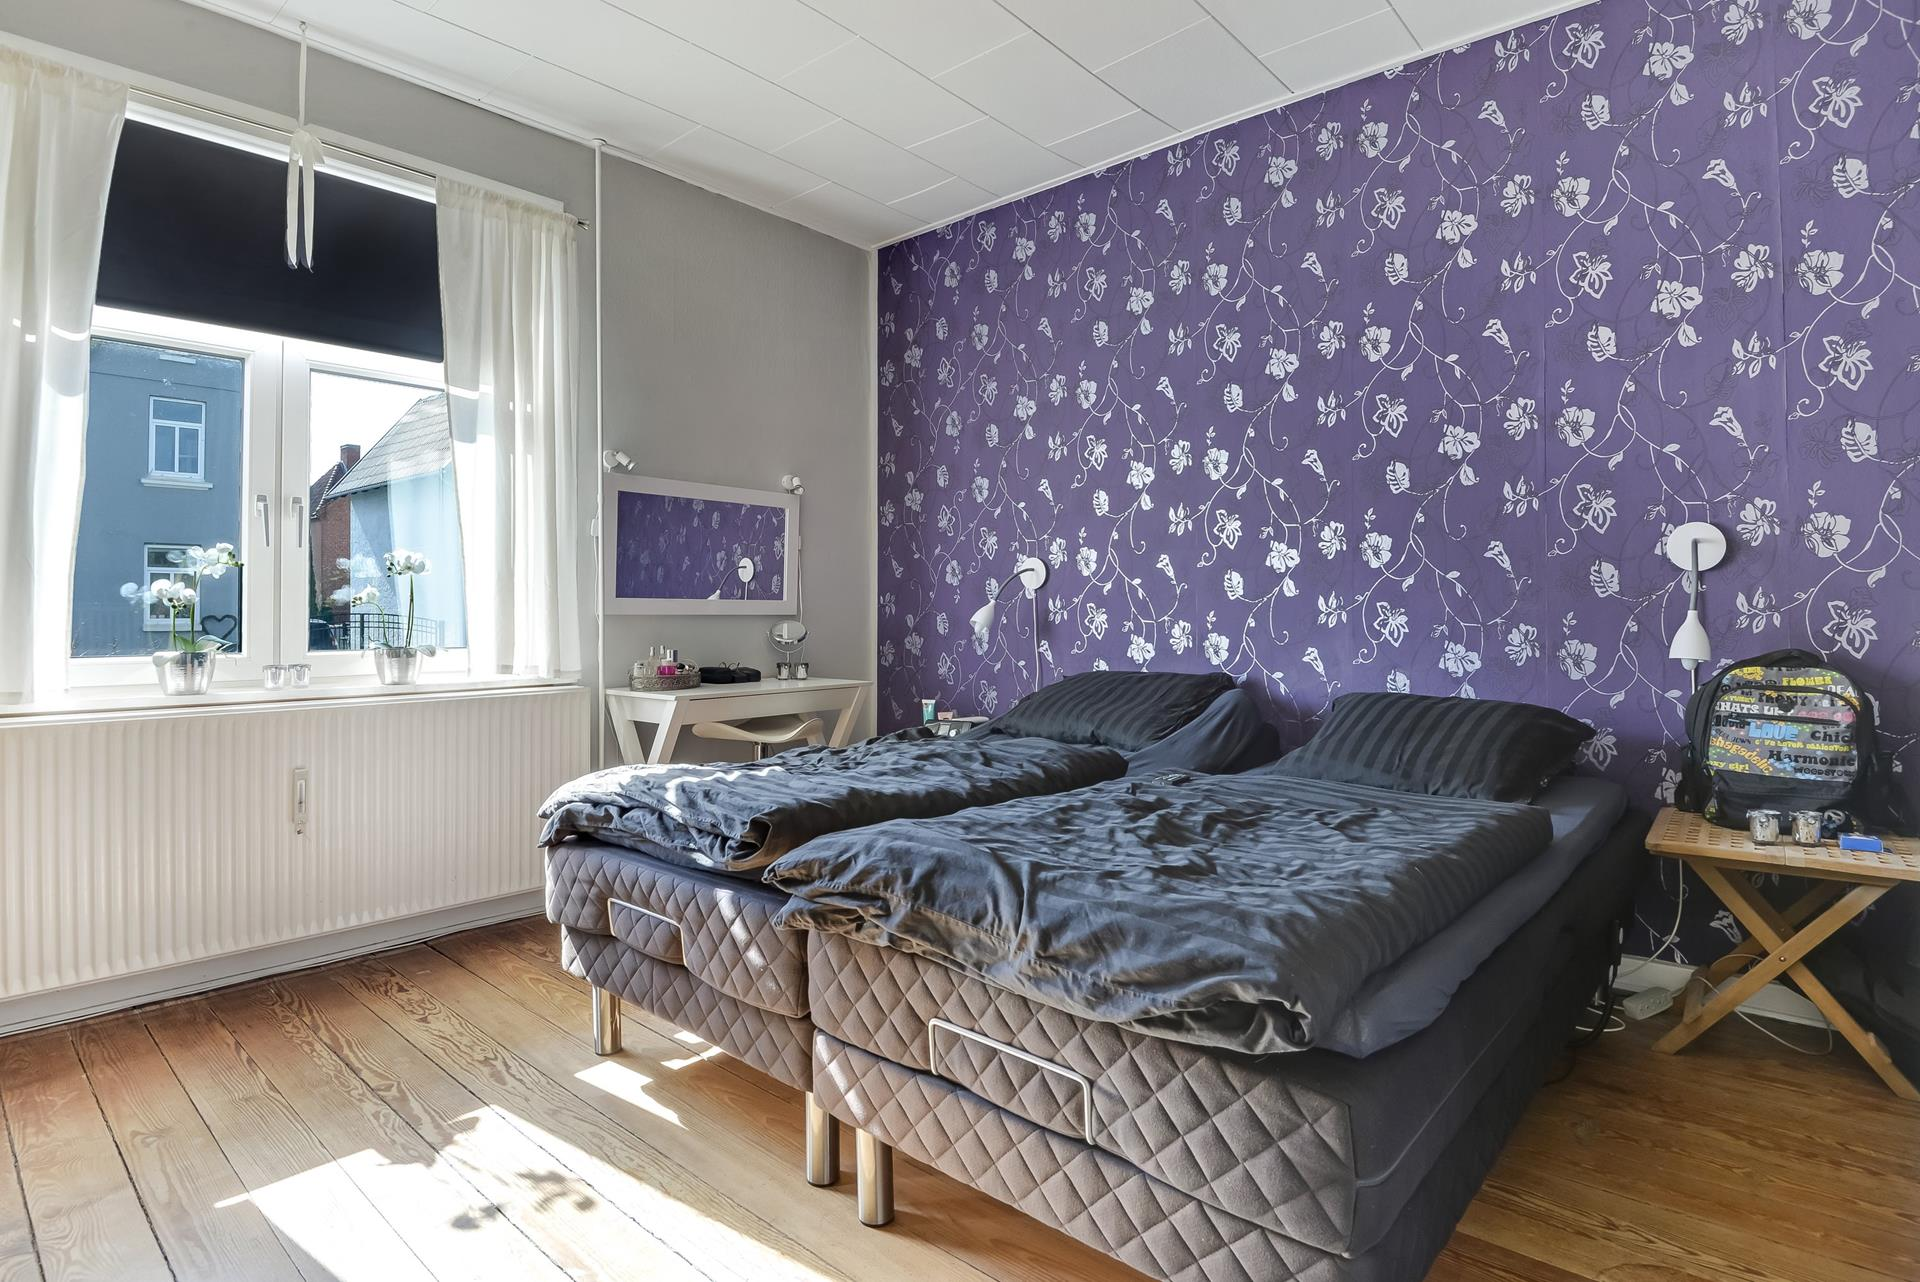 Bolig/erhverv på Goethesgade i Sønderborg - Soveværelse